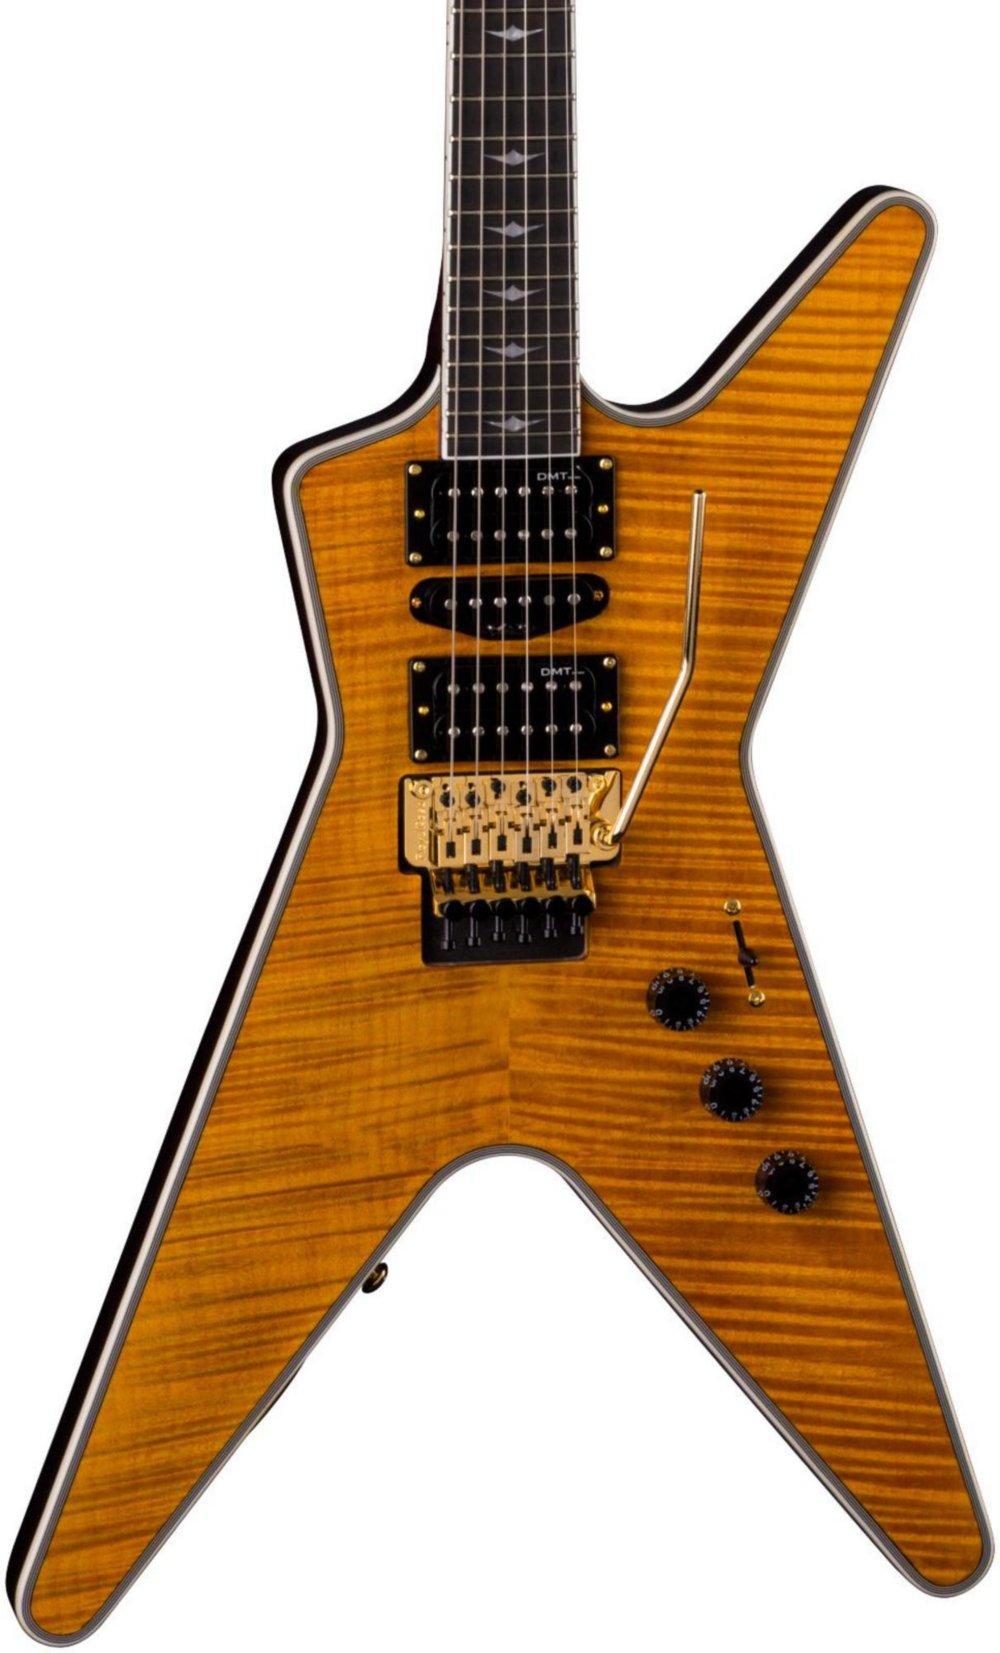 Cheap Dean ML SB F TAM Solid-Body Electric Guitar Trans Amber Black Friday & Cyber Monday 2019